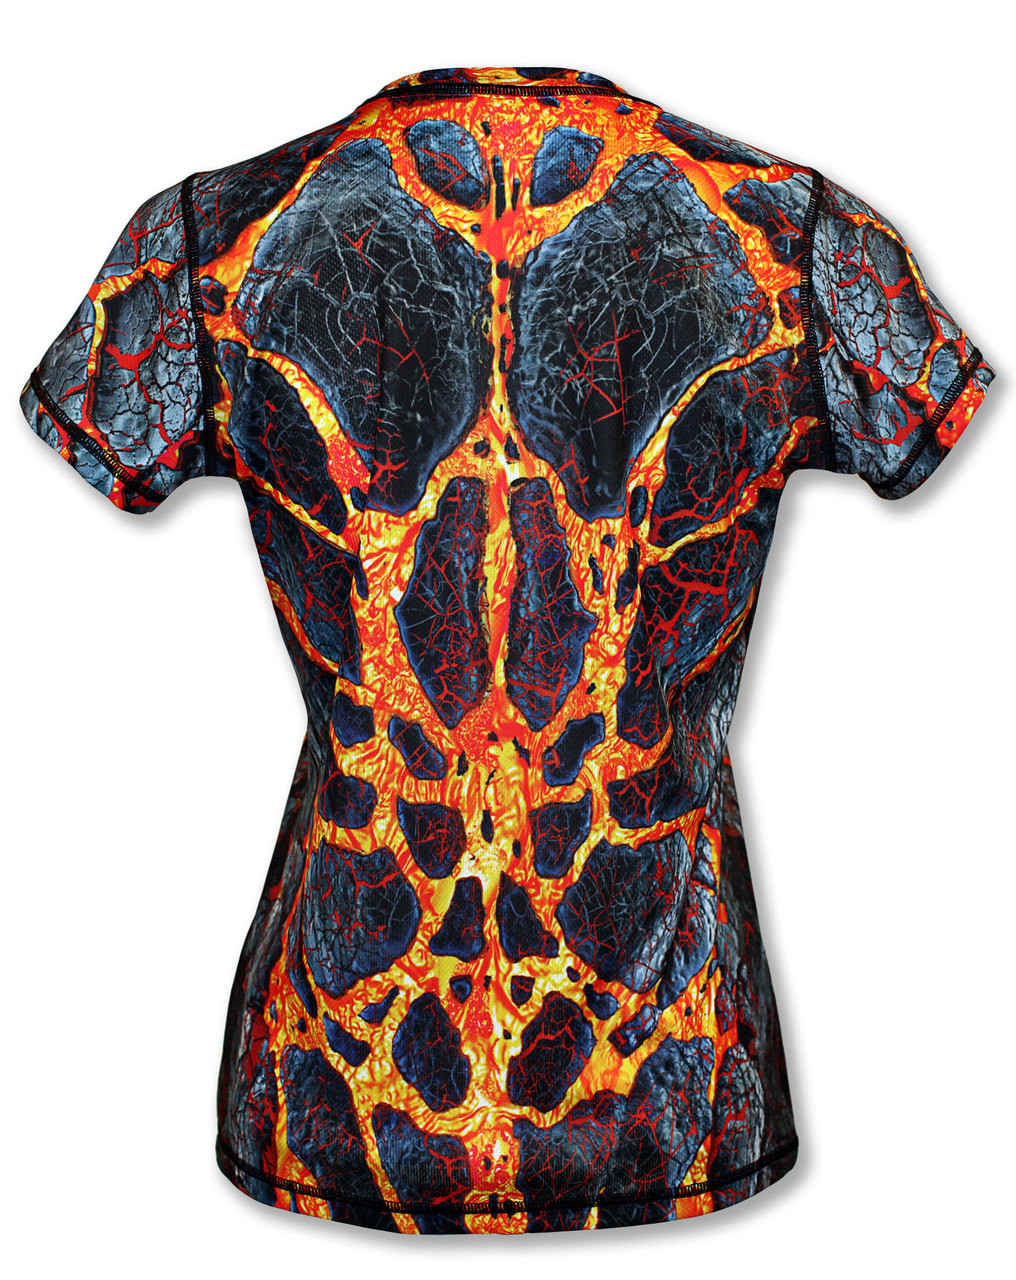 INKnBURN Women's Blast Tech Shirt Back